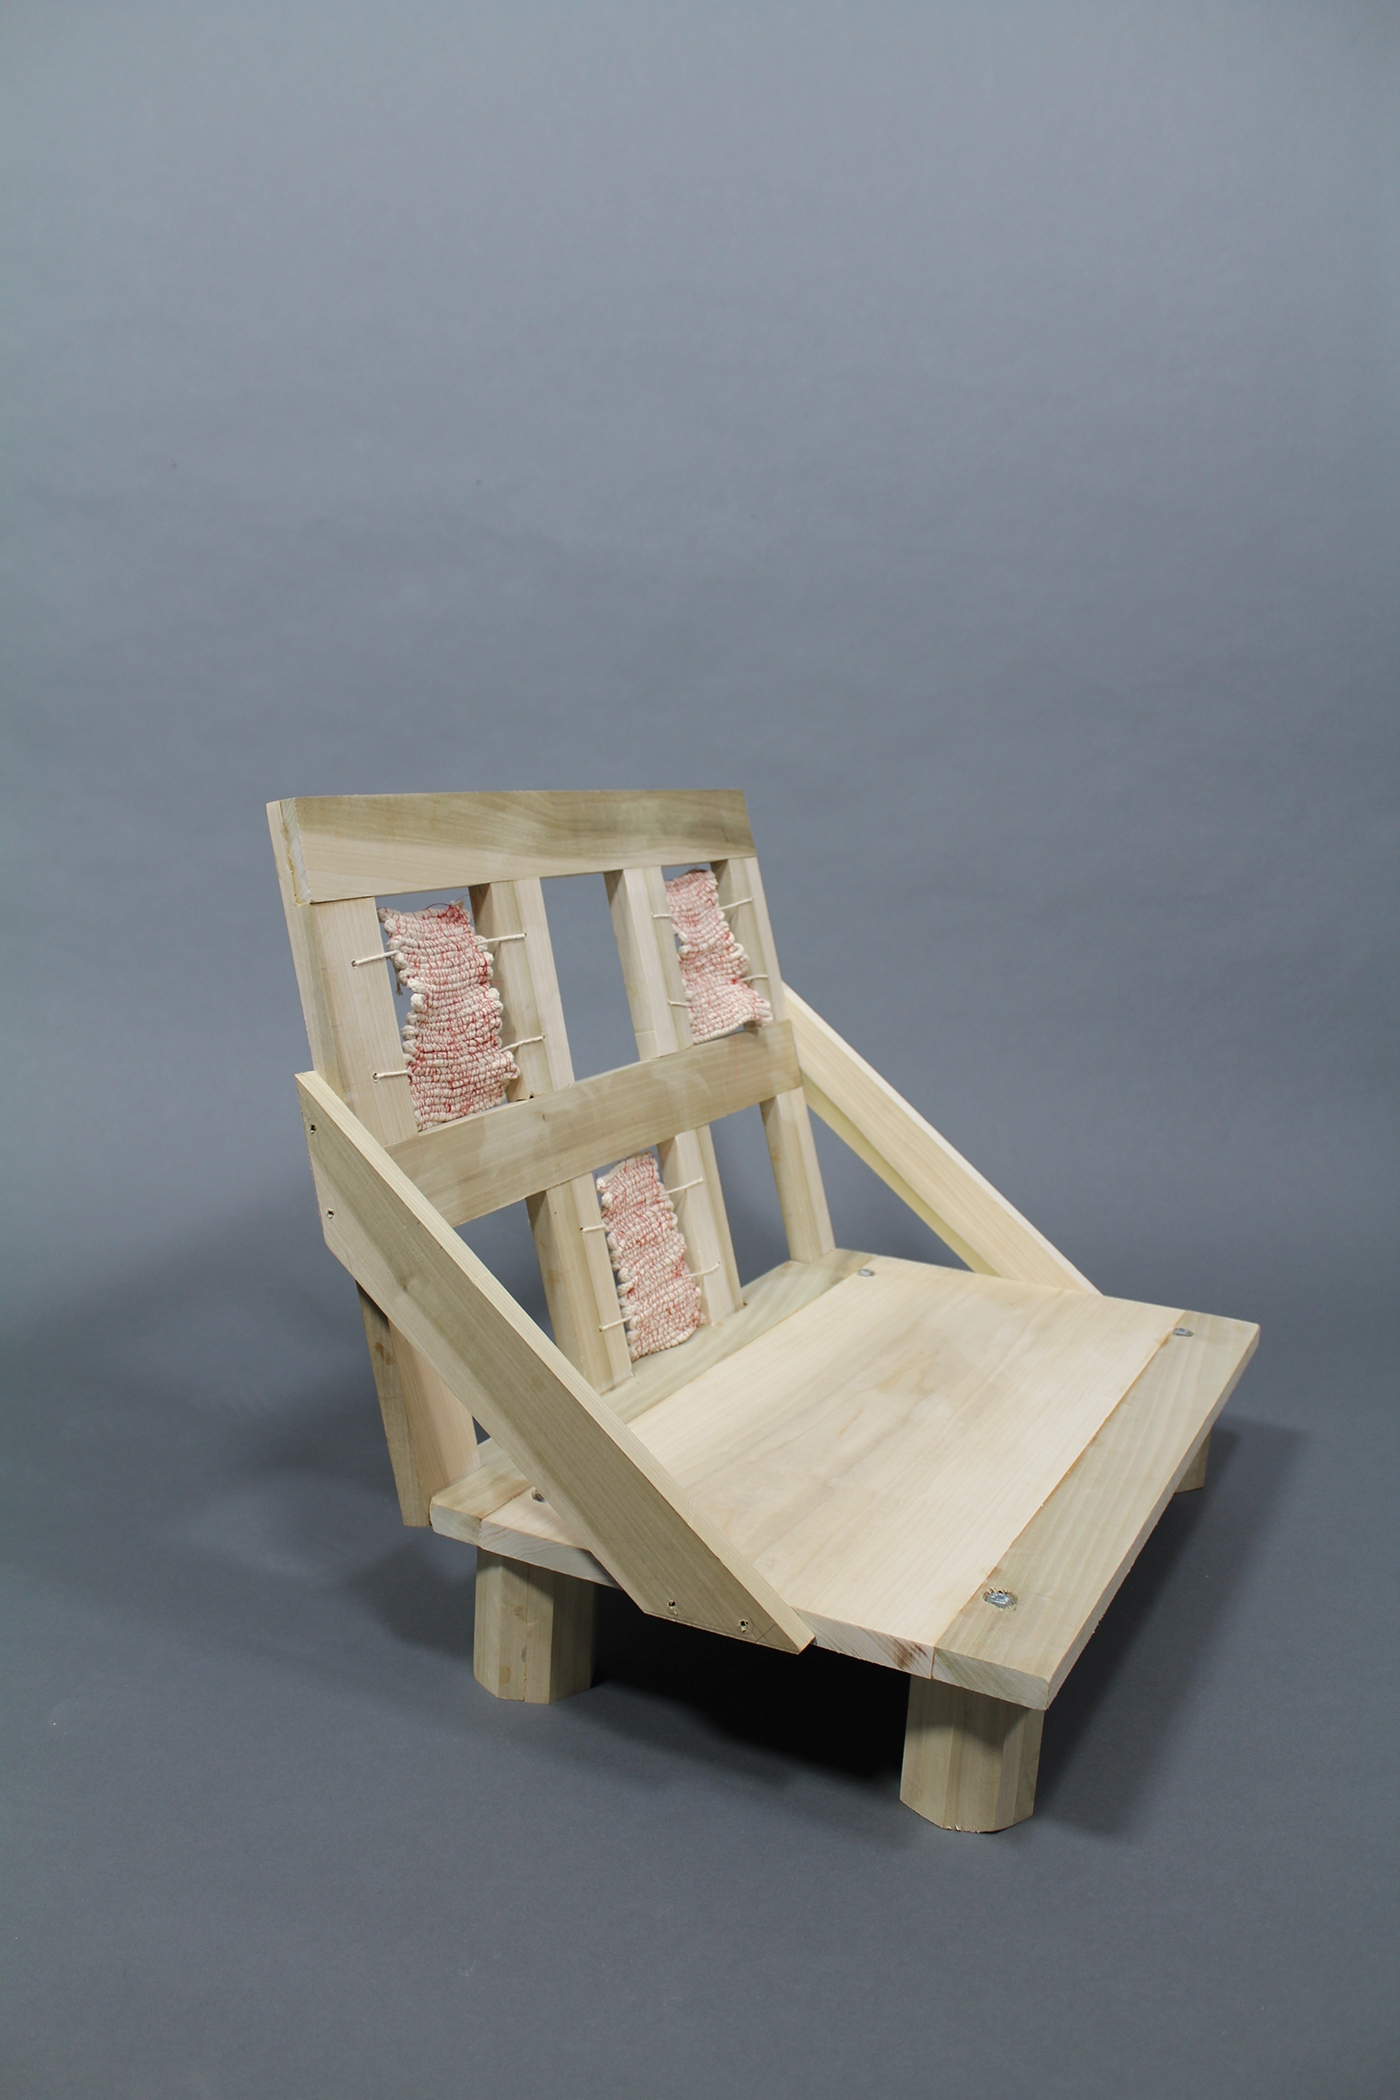 wood woodworking Powertools